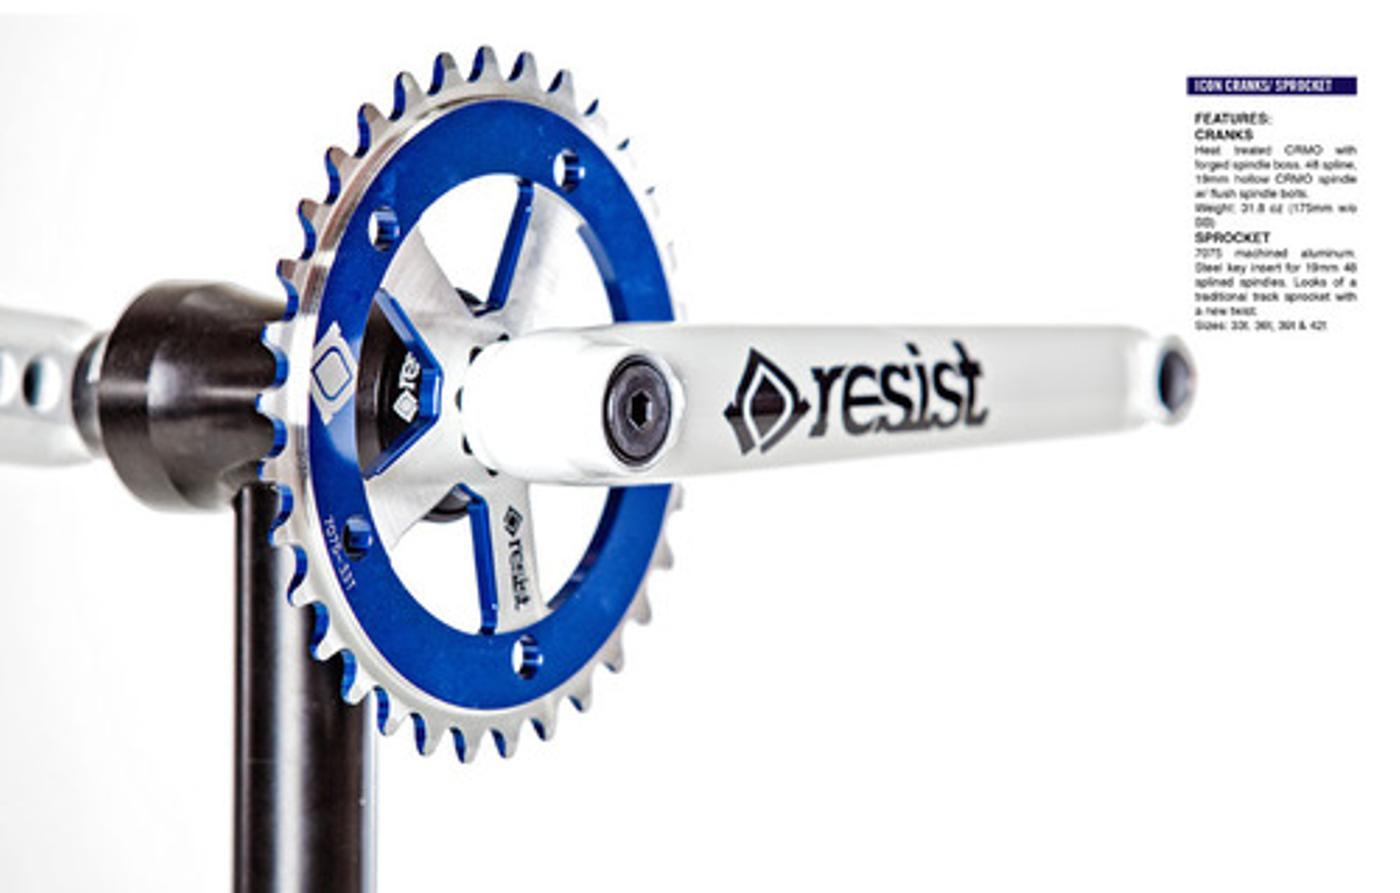 resist_crank.jpg